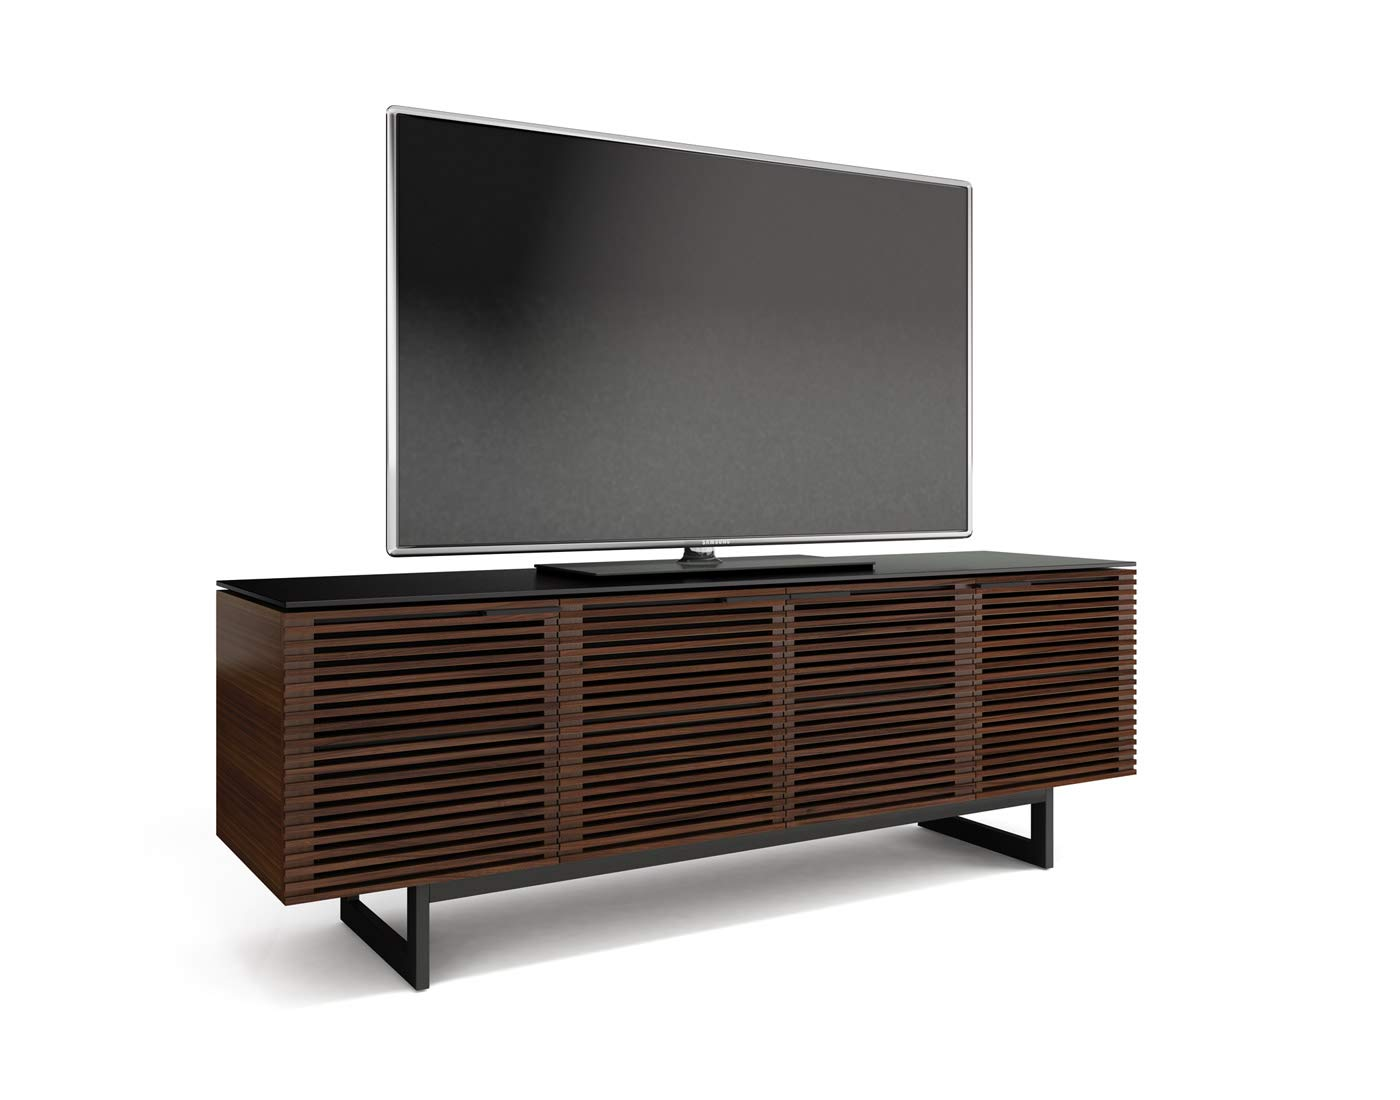 BDI 8179 CWL Corridor Quad TV Stand & Media Cabinet, Chocolate Stained Walnut by BDI Furniture